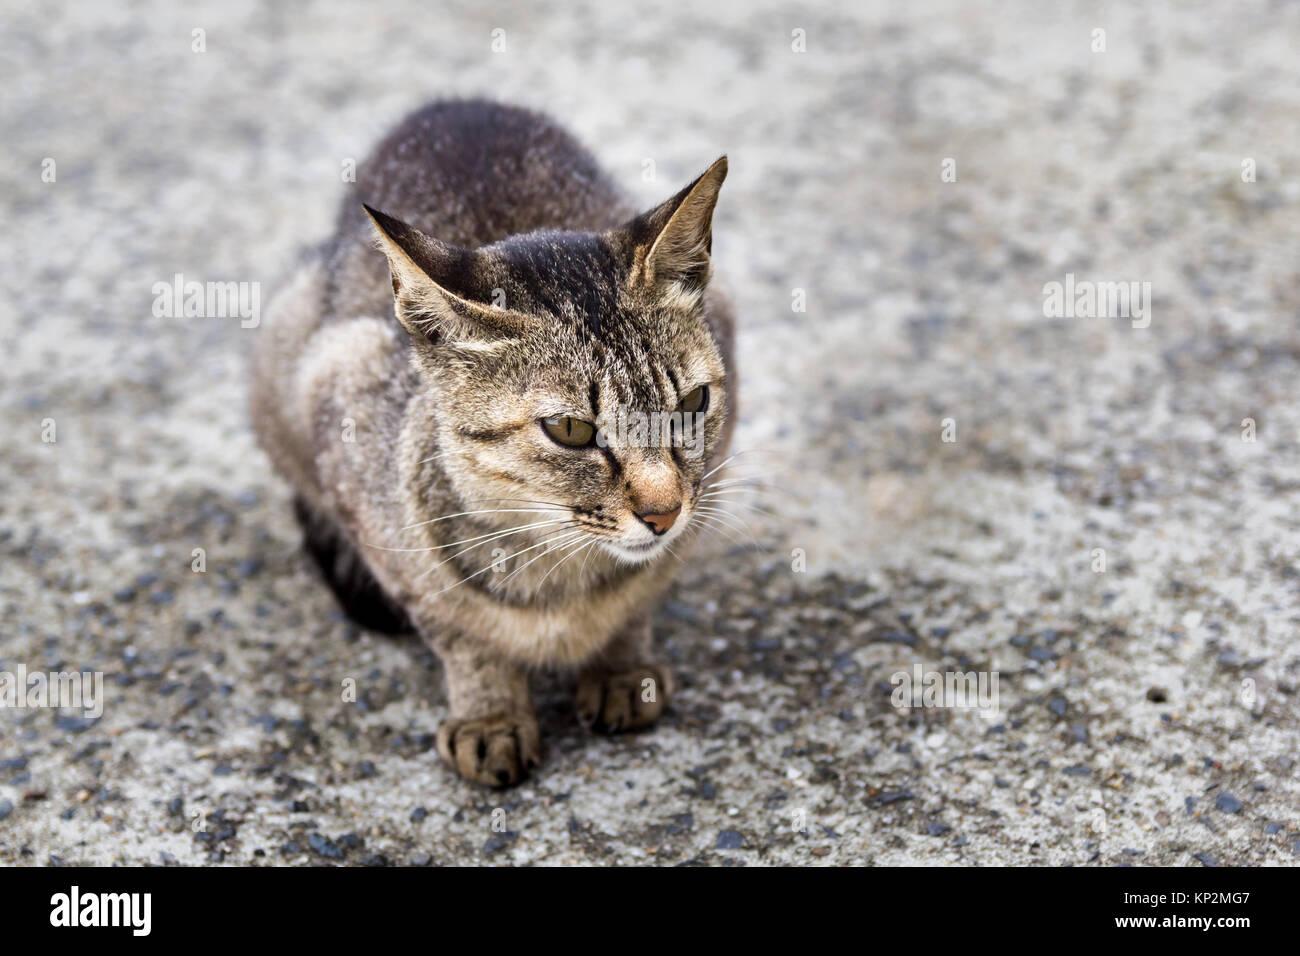 Cat on Manabeshima Island, Seto Inland Sea, Japan - Stock Image